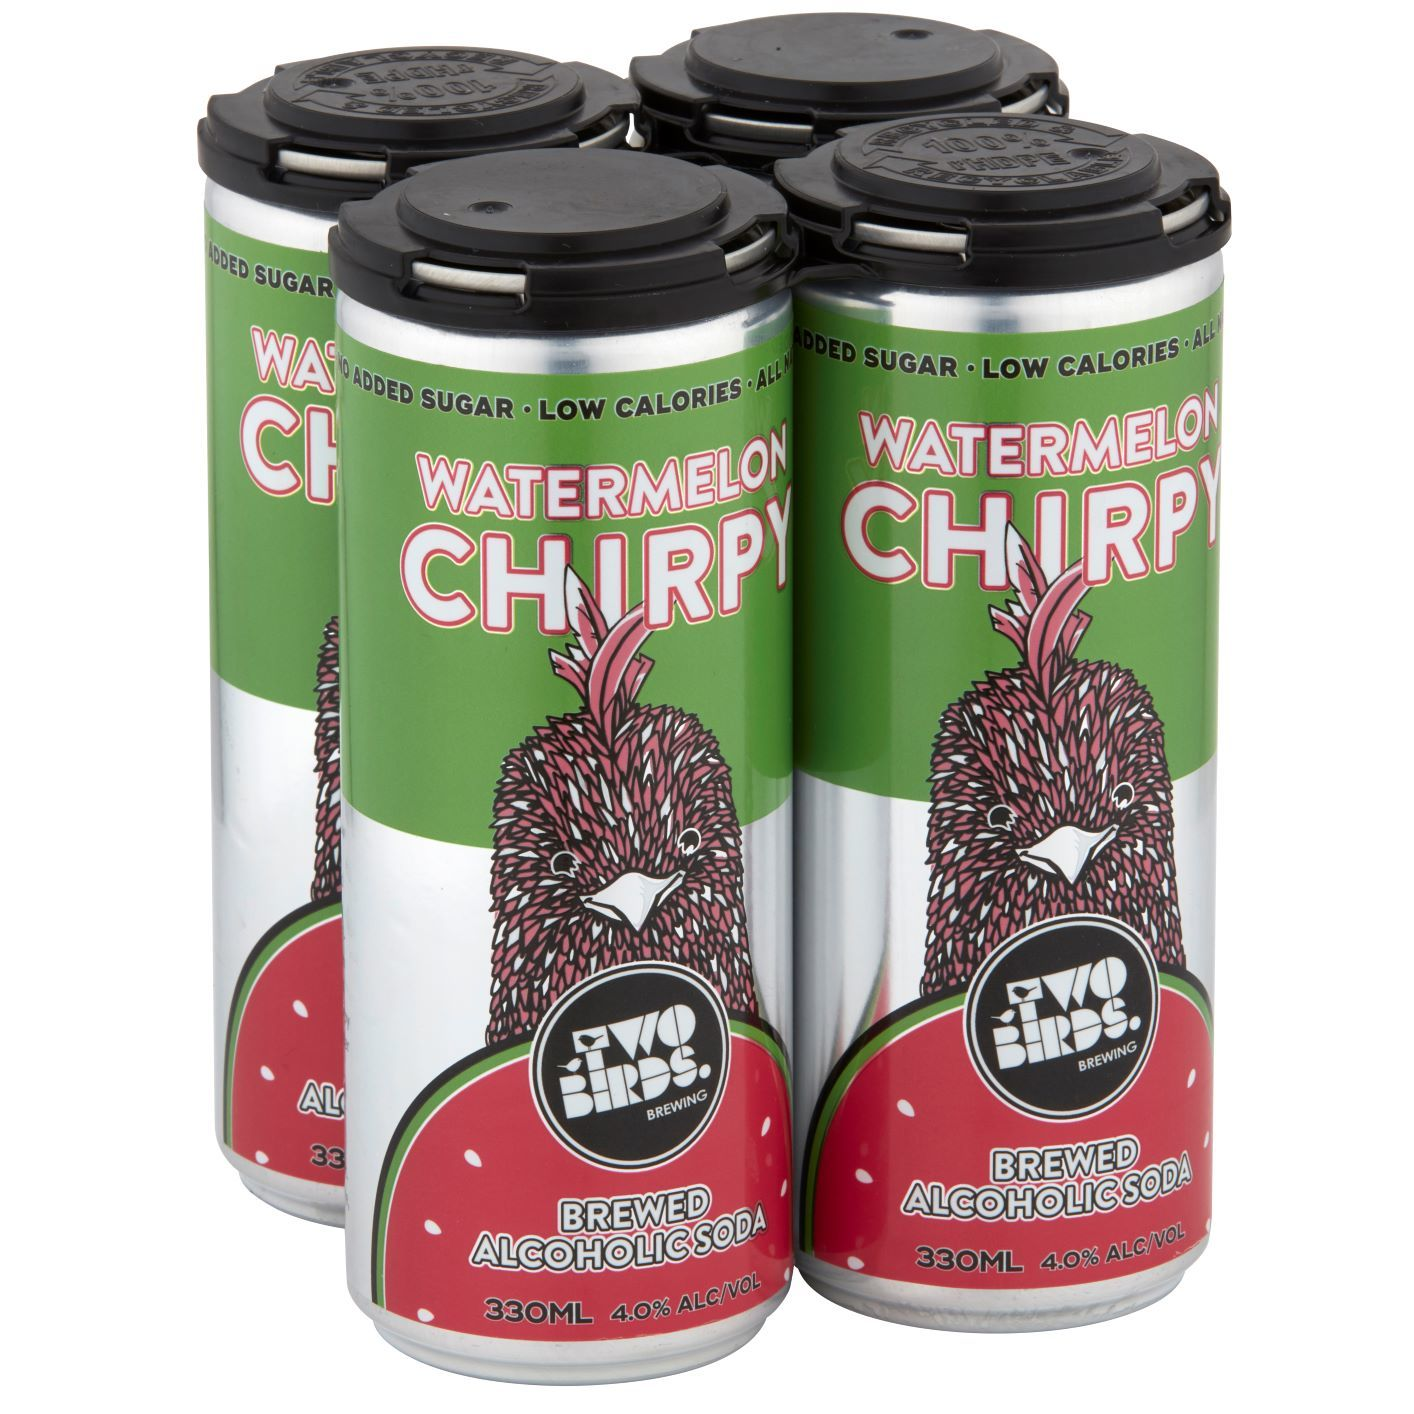 Four Watermelon Chirpy alcoholic sodas